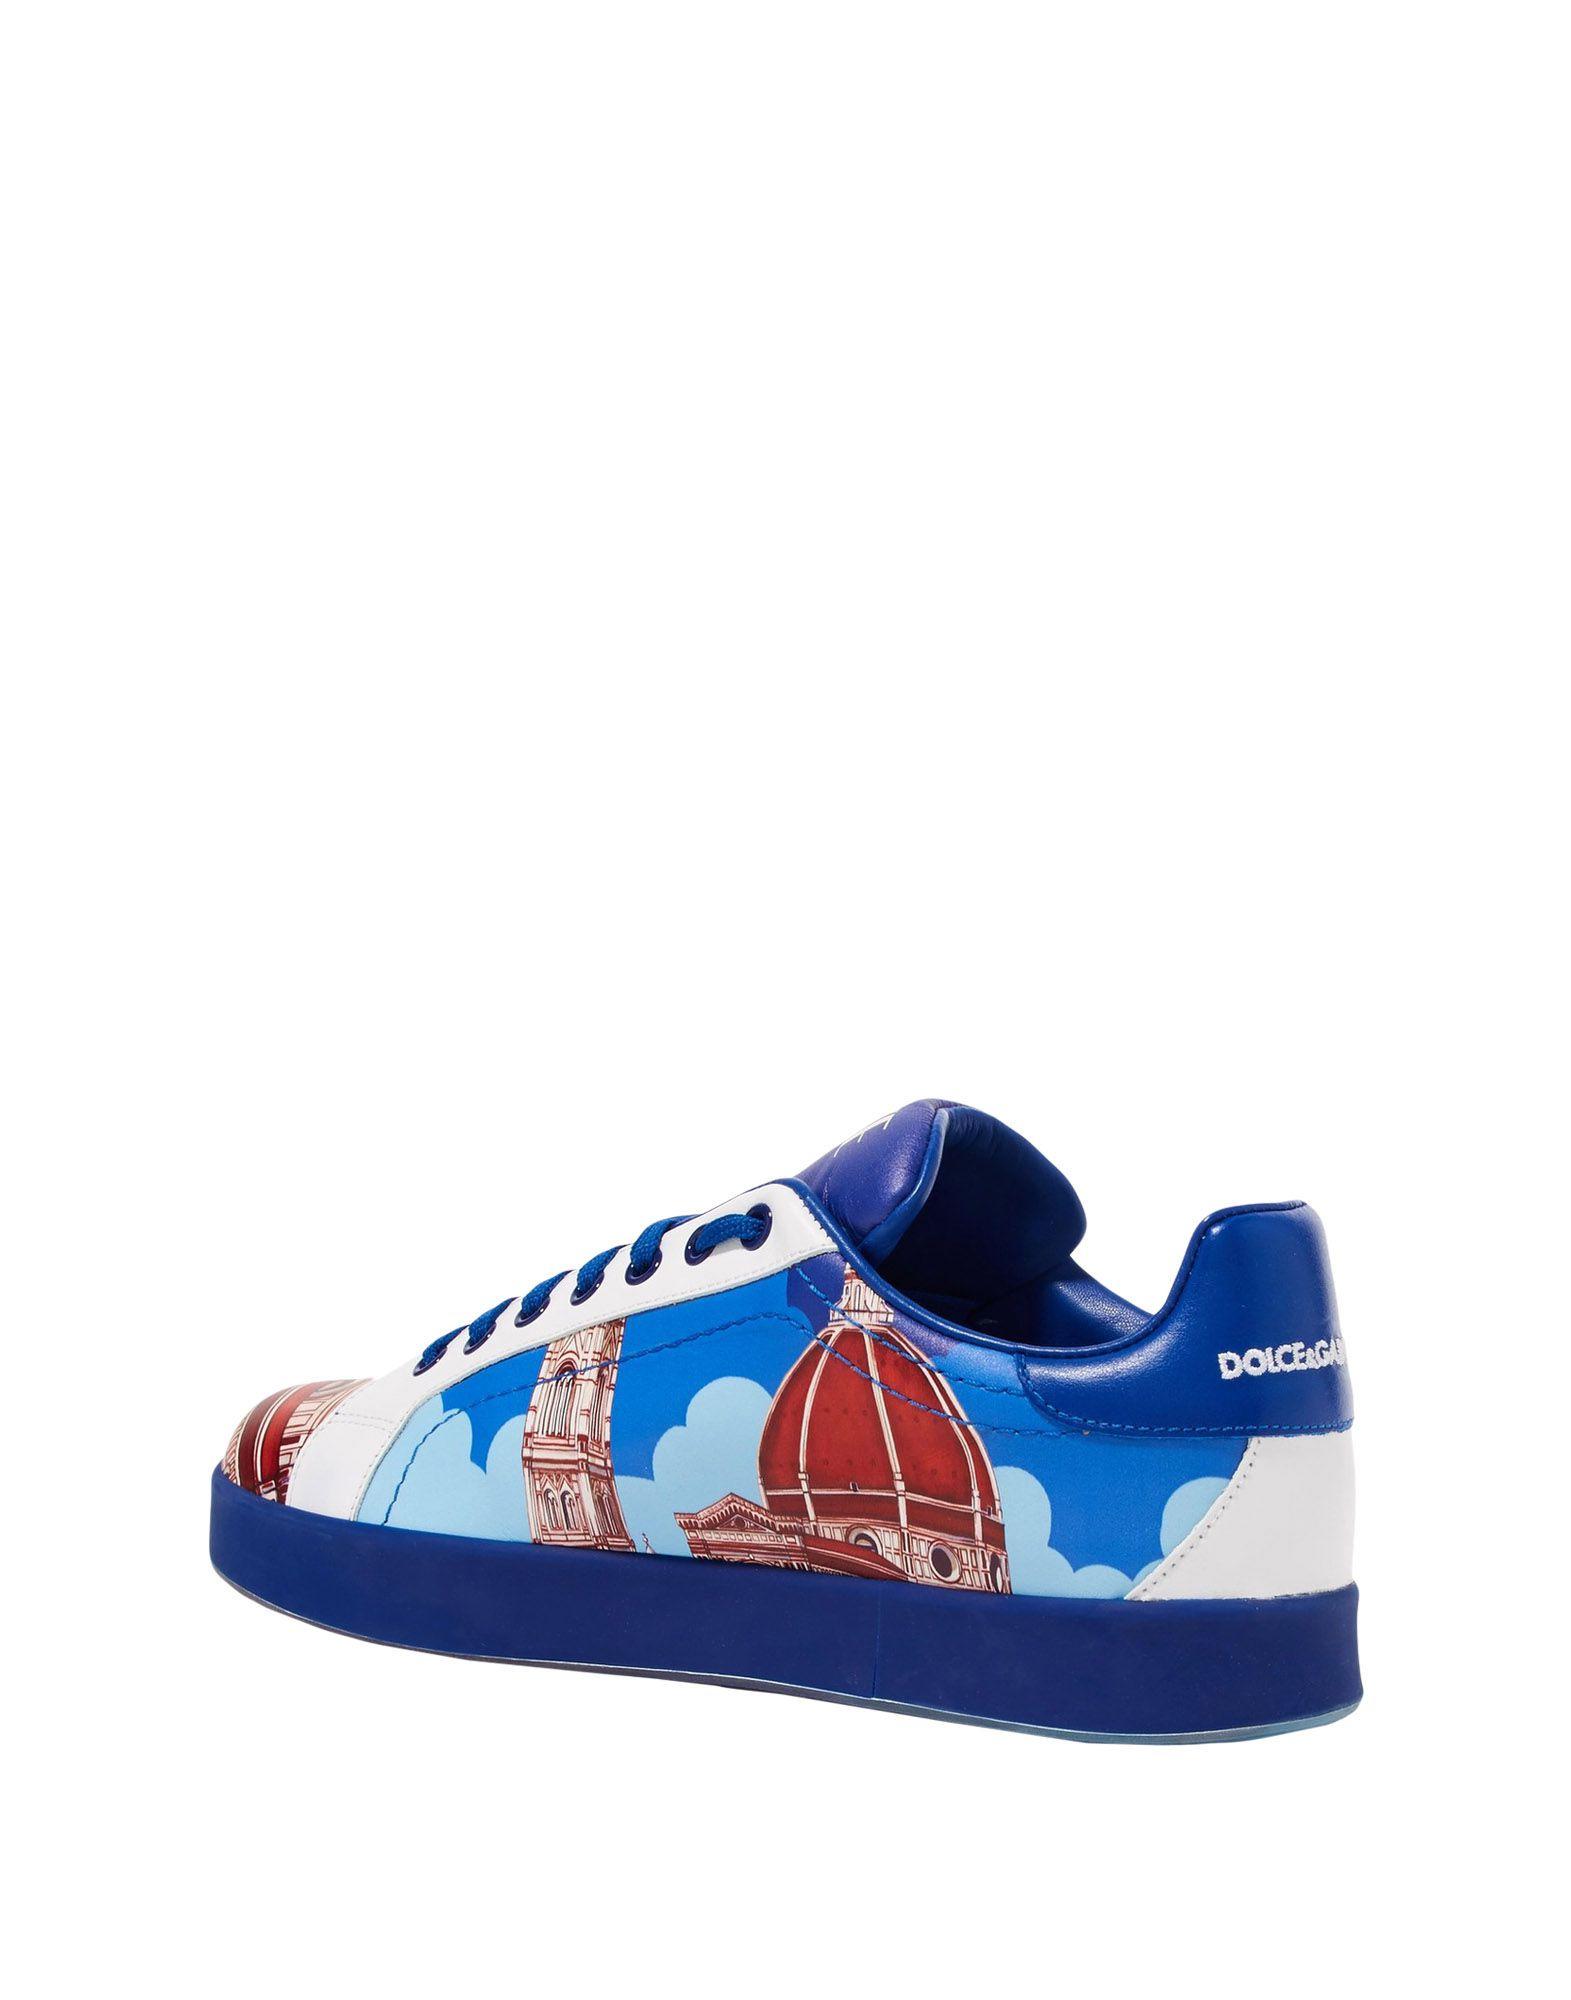 Dolce & Gabbana Sneakers Schuhe Damen  11512502BV Neue Schuhe Sneakers 5c0cc3